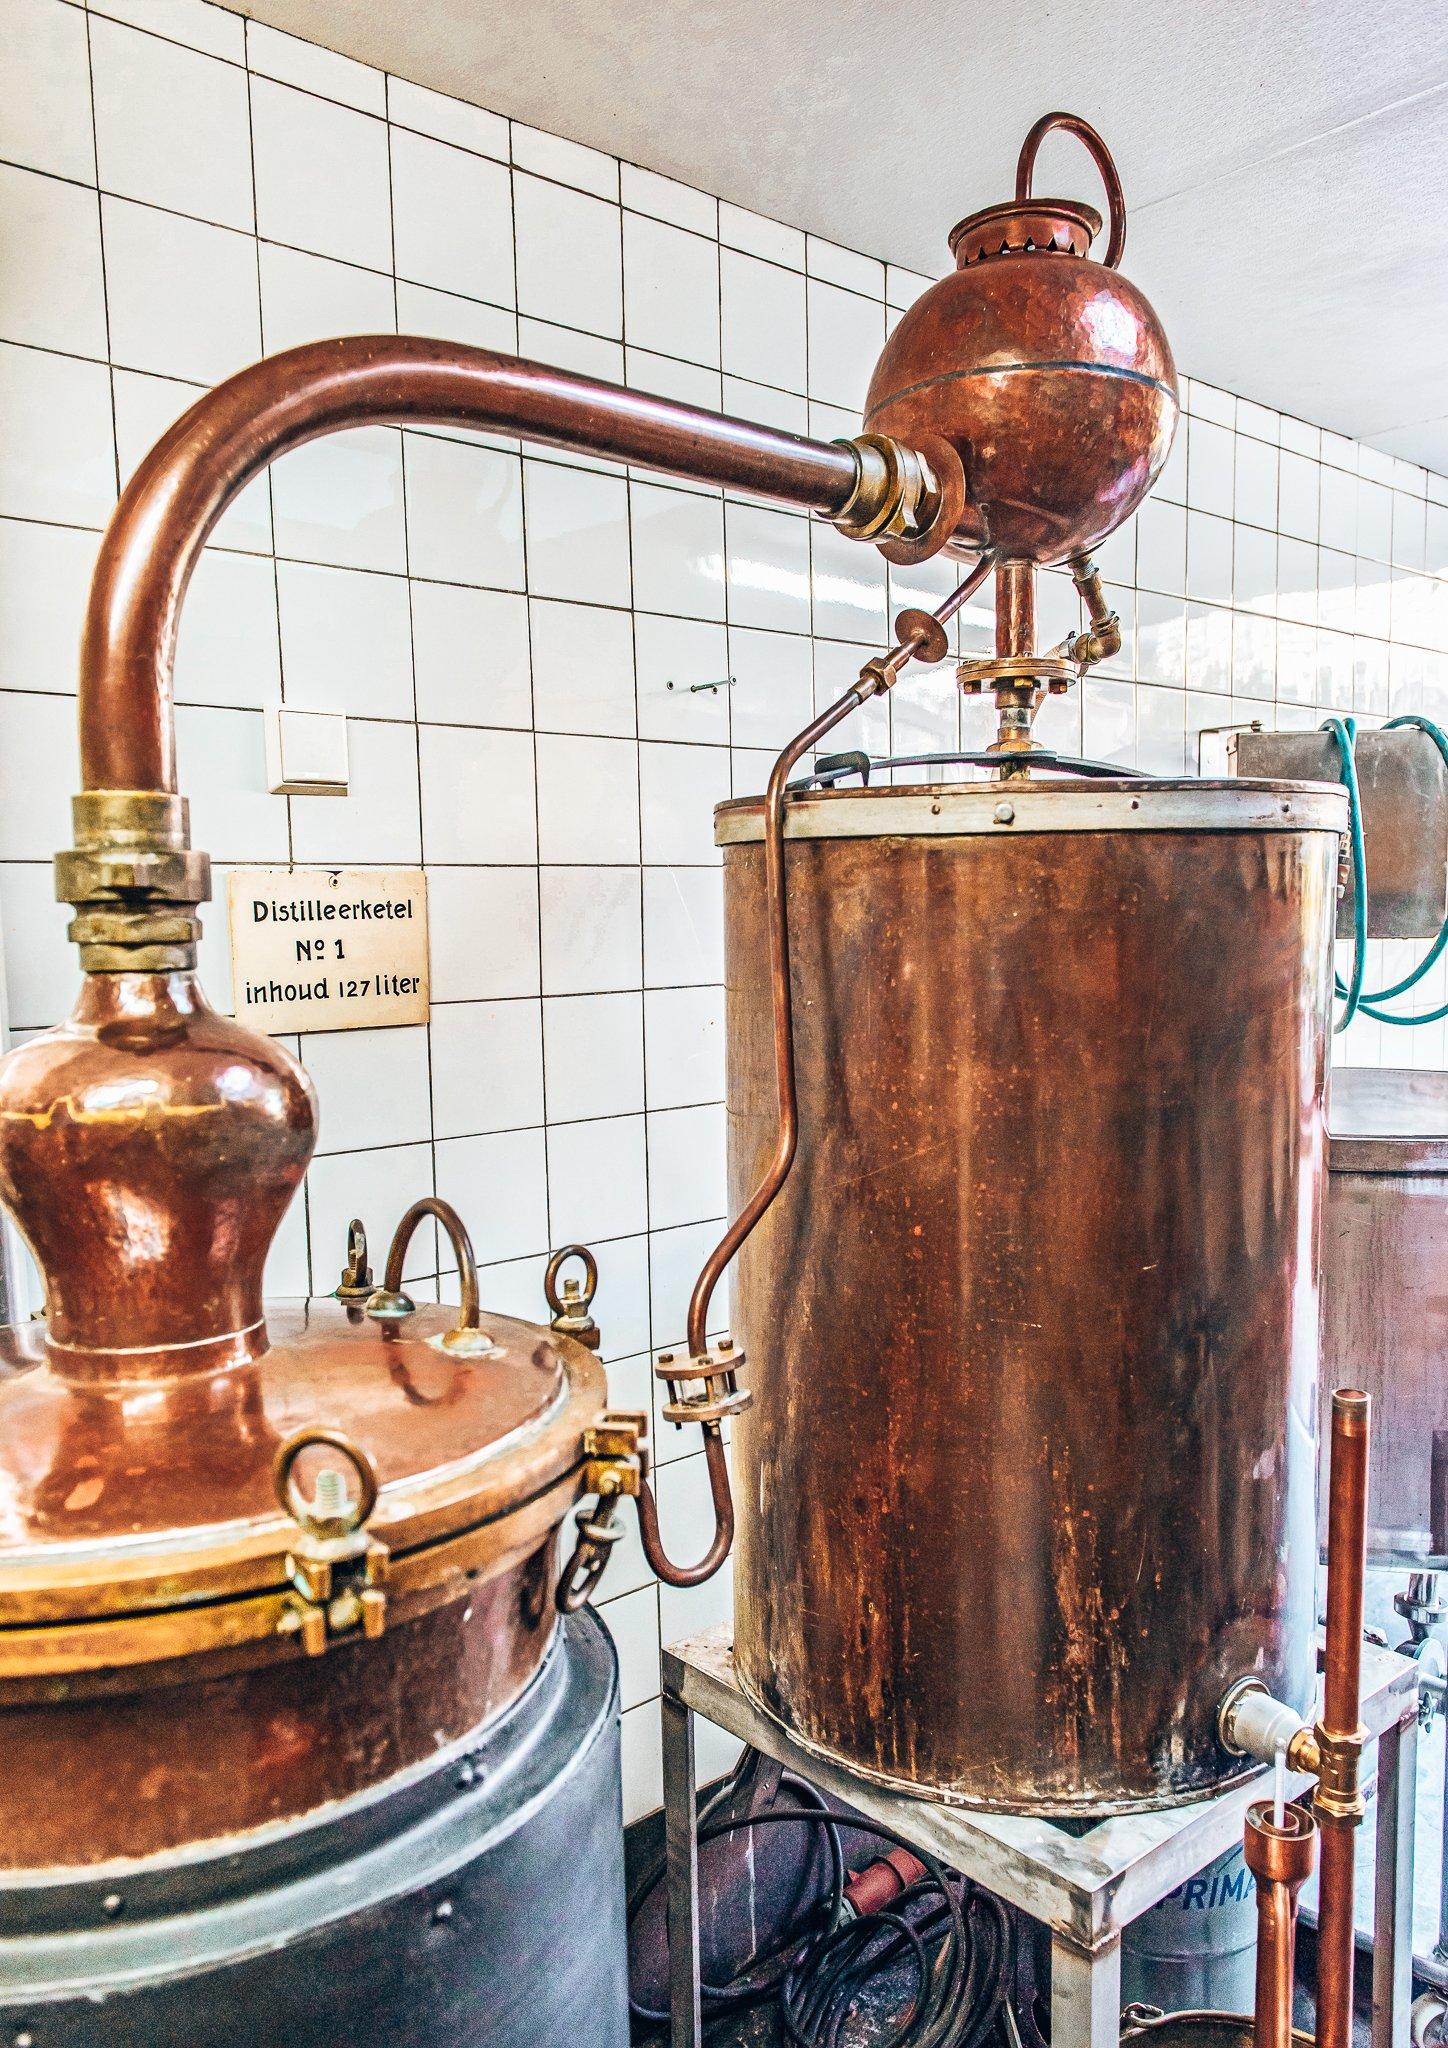 Distilleerketel Cley Distillery, Alles over gi.